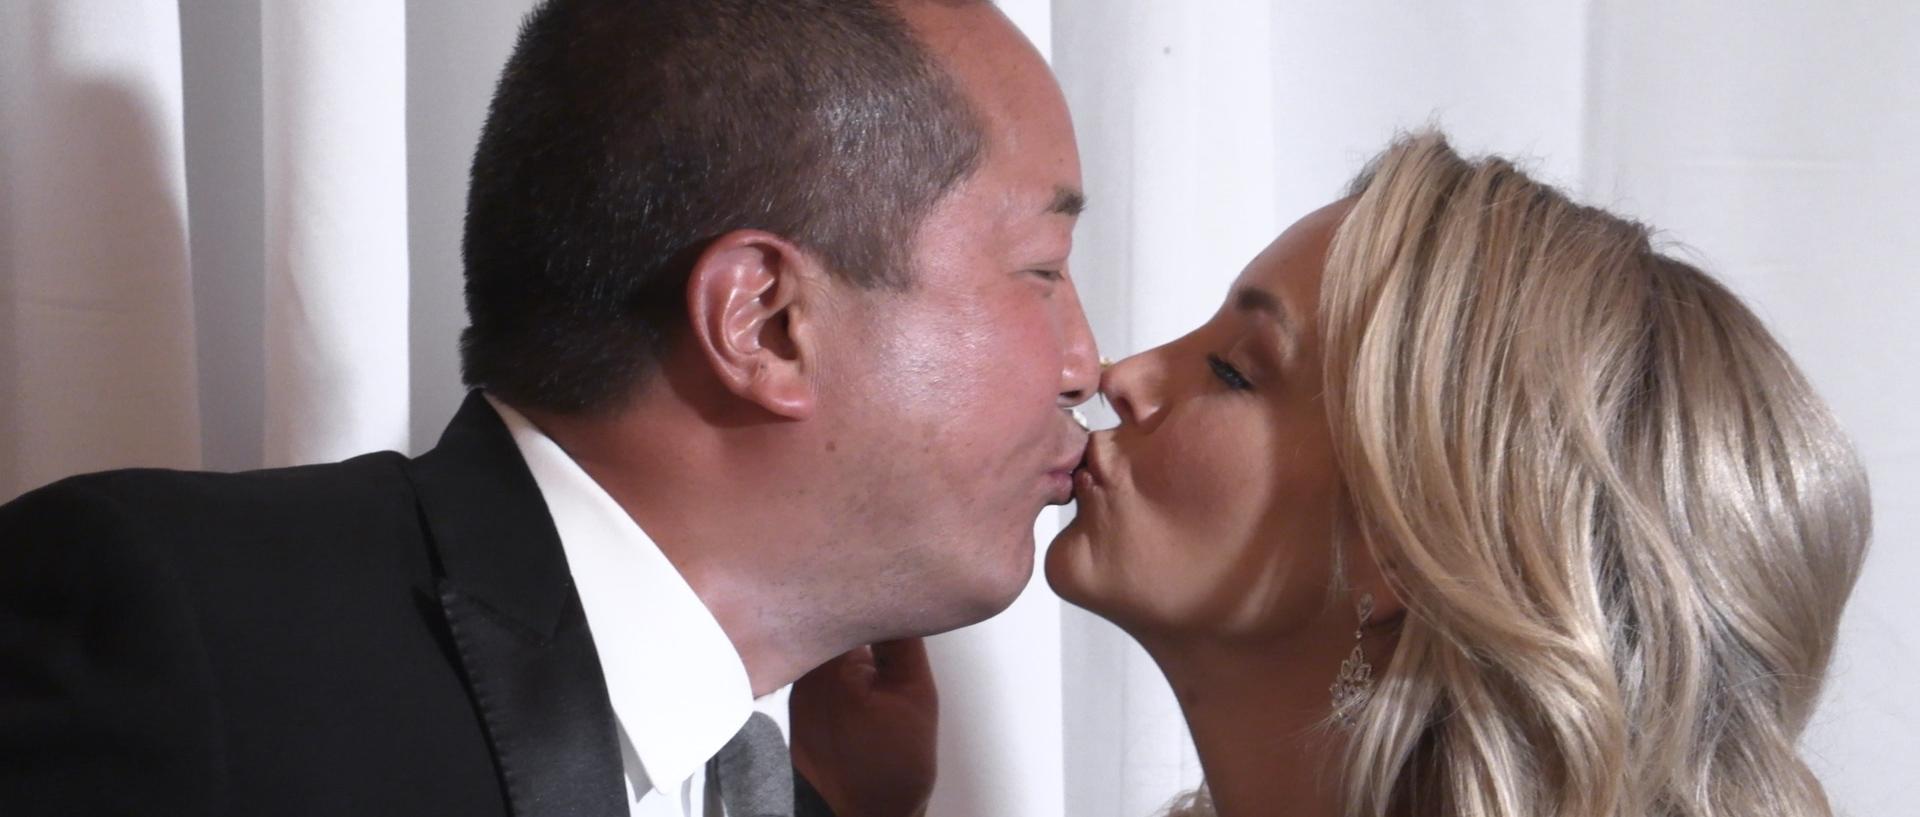 Jessica and Jeffrey Wedding Story.06_39_02_04.Still032.jpg